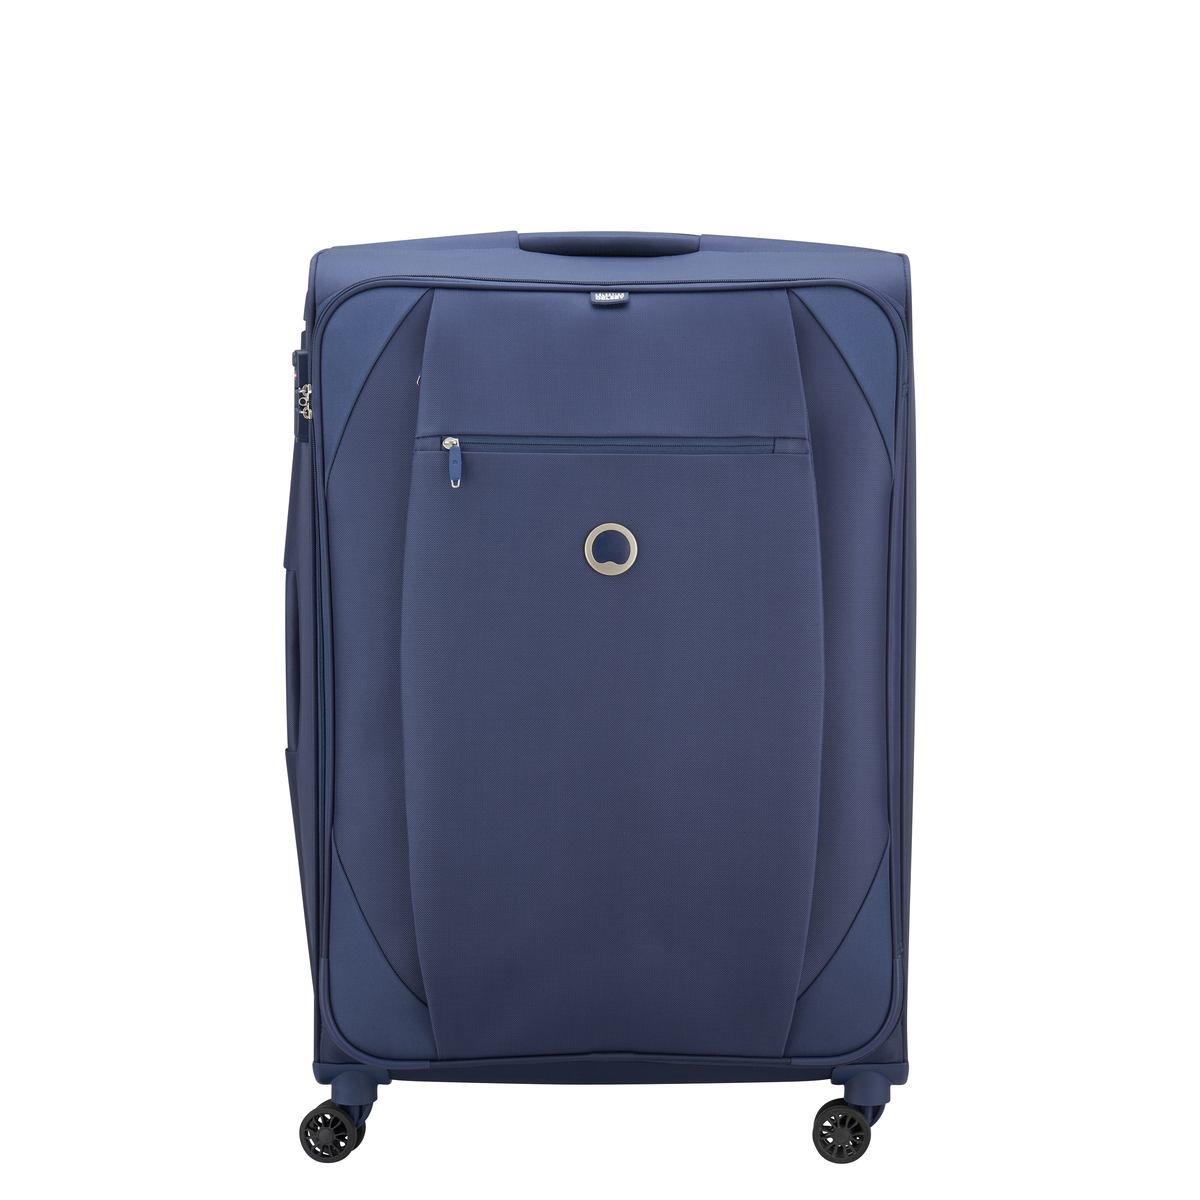 Delsey Βαλίτσα μεγάλη 78x50x30cm σειρά Rami Blue